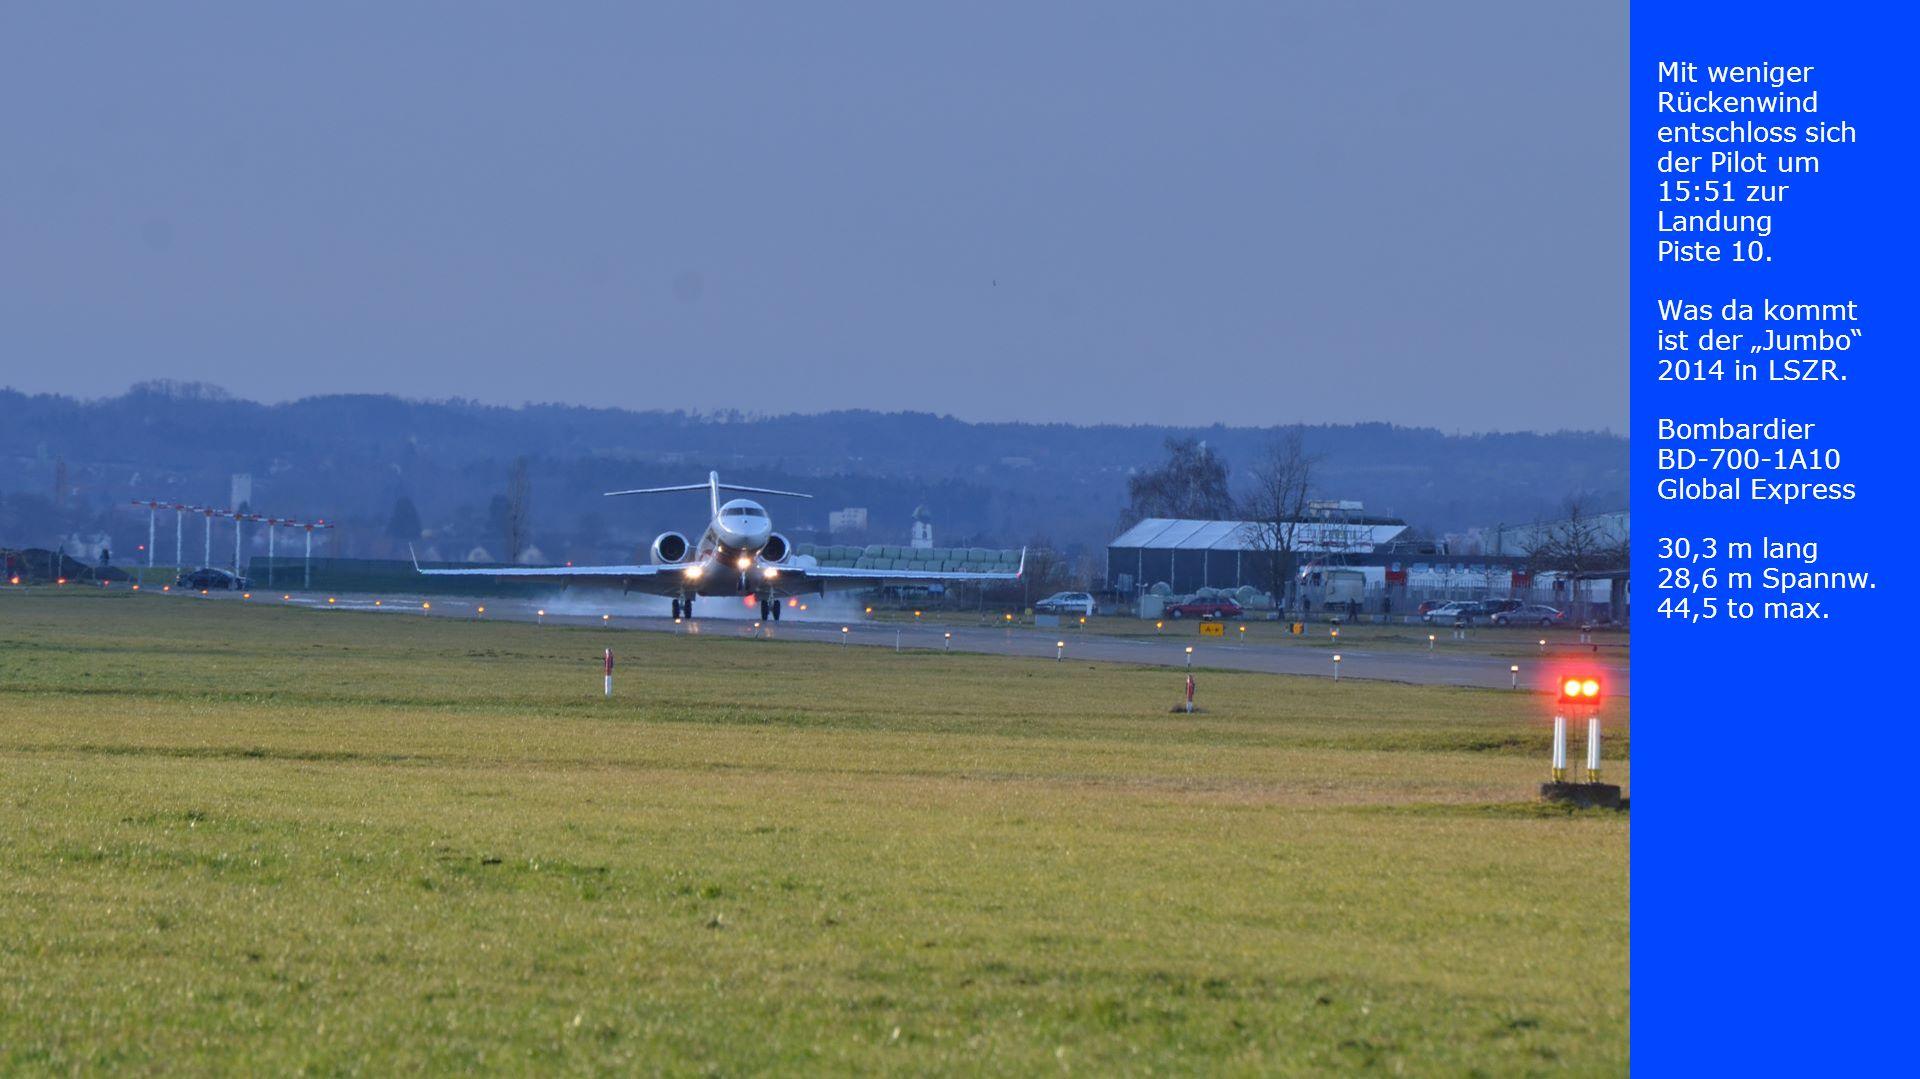 Mit weniger Rückenwind entschloss sich der Pilot um 15:51 zur Landung Piste 10. Was da kommt ist der Jumbo 2014 in LSZR. Bombardier BD-700-1A10 Global